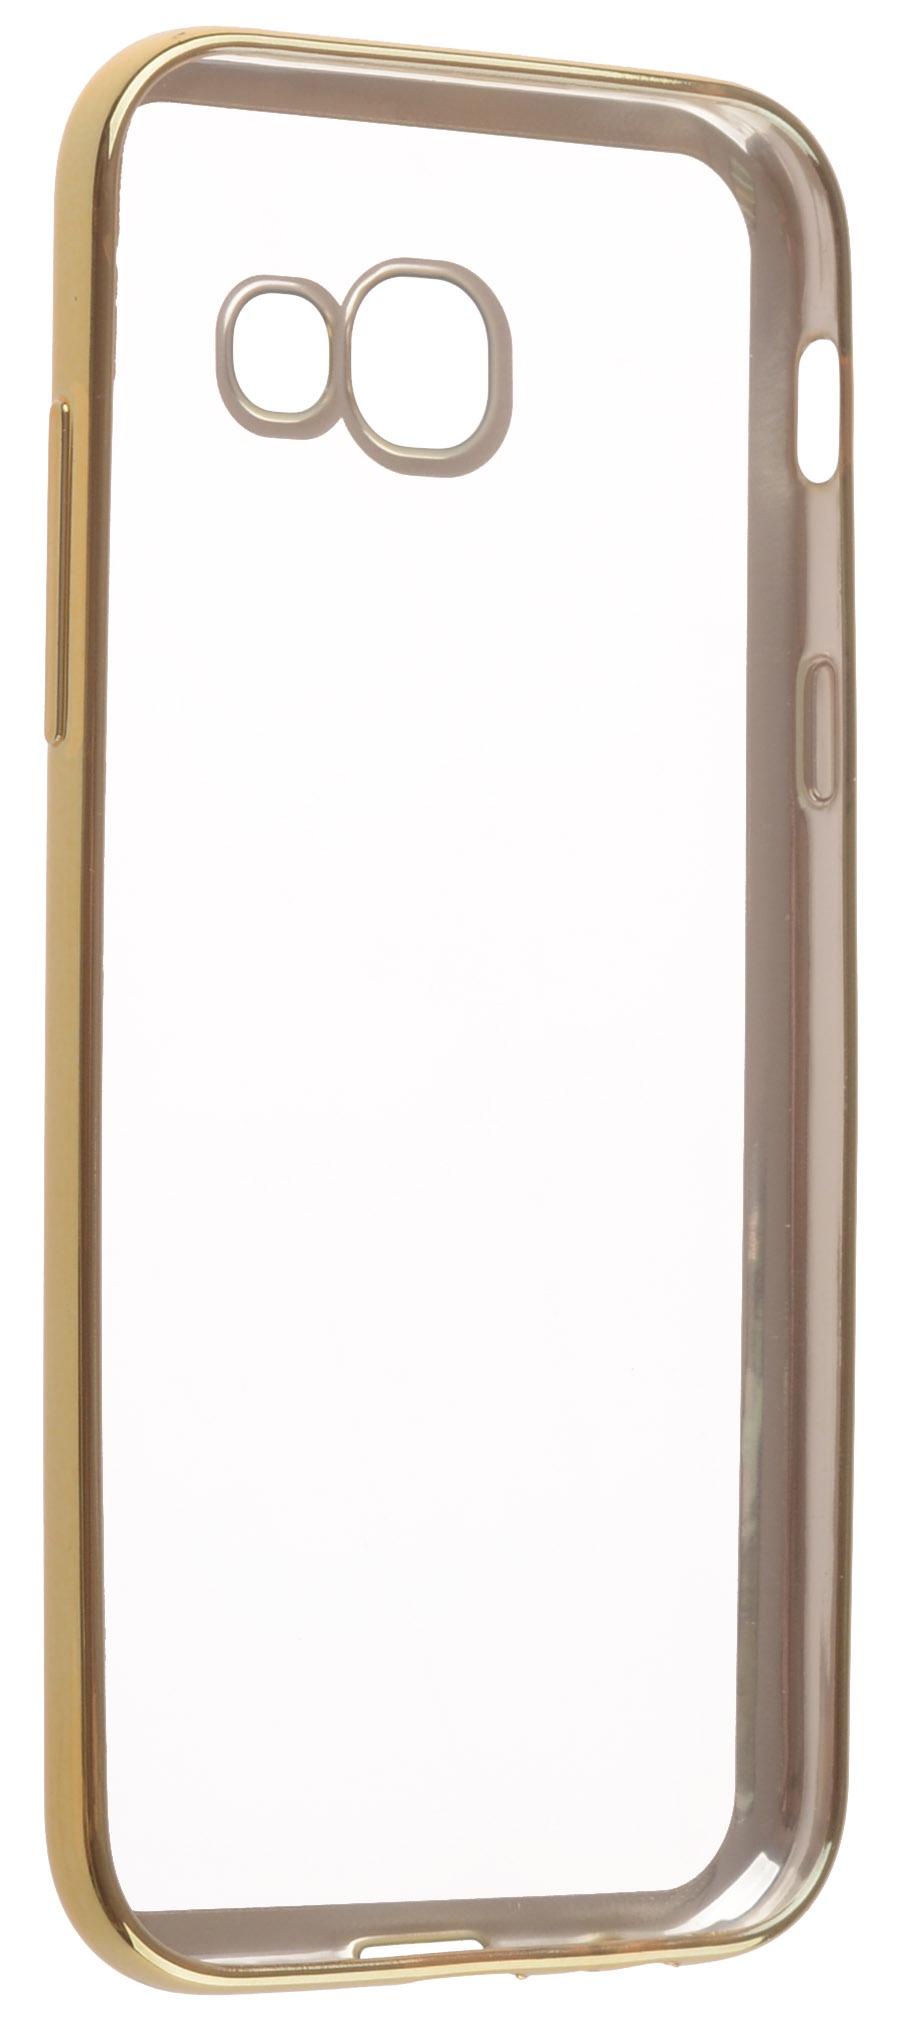 все цены на Чехол для сотового телефона skinBOX Silicone chrome border, 4660041408225, золотой онлайн